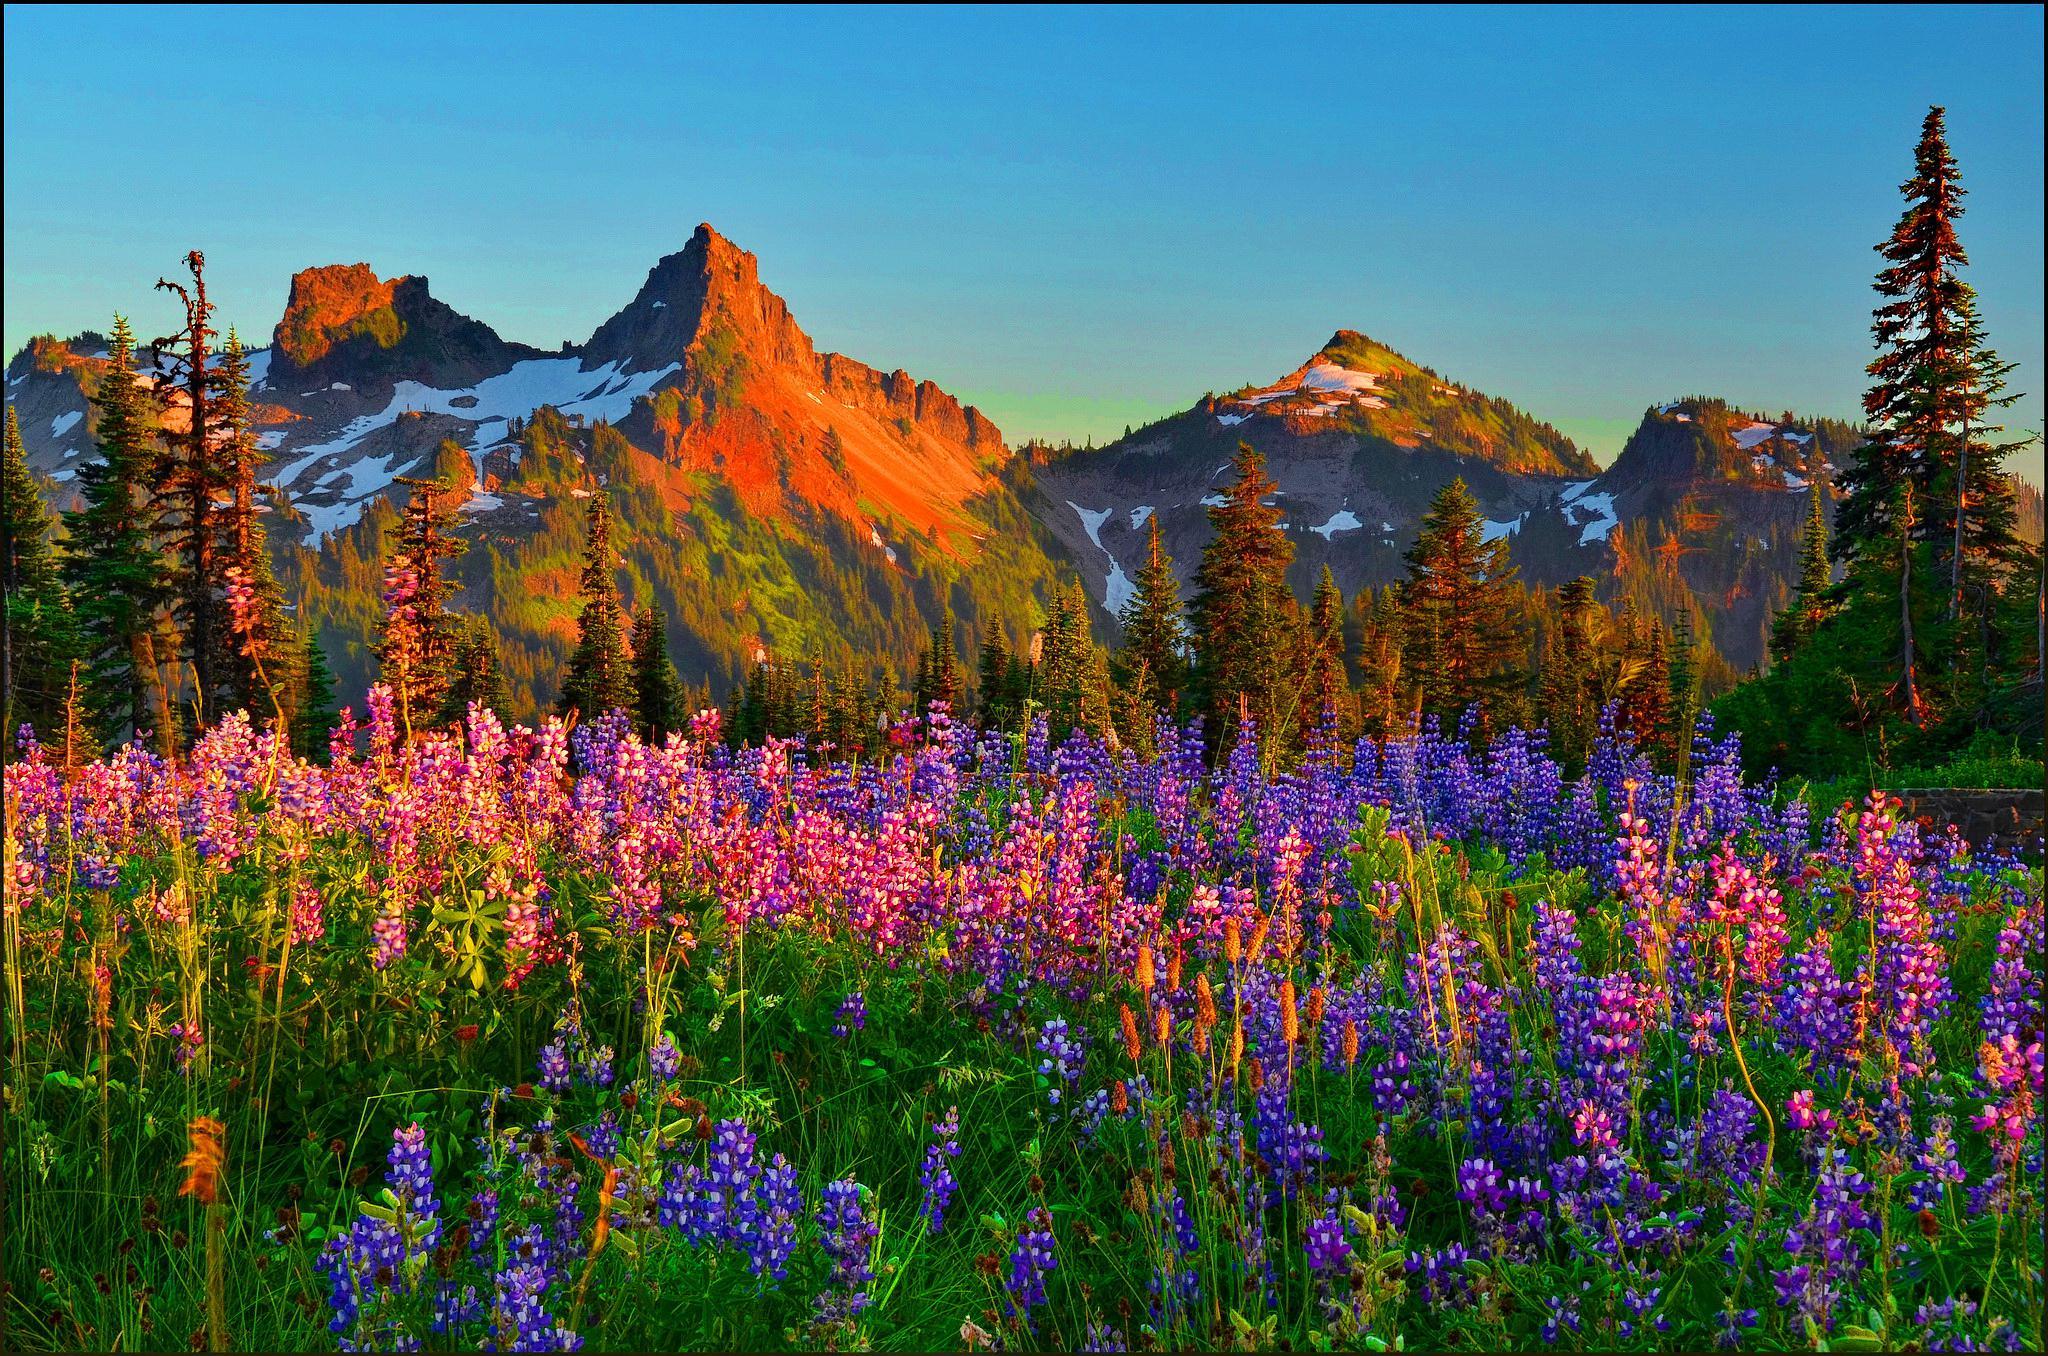 37+] Mountain Wildflowers Wallpaper on